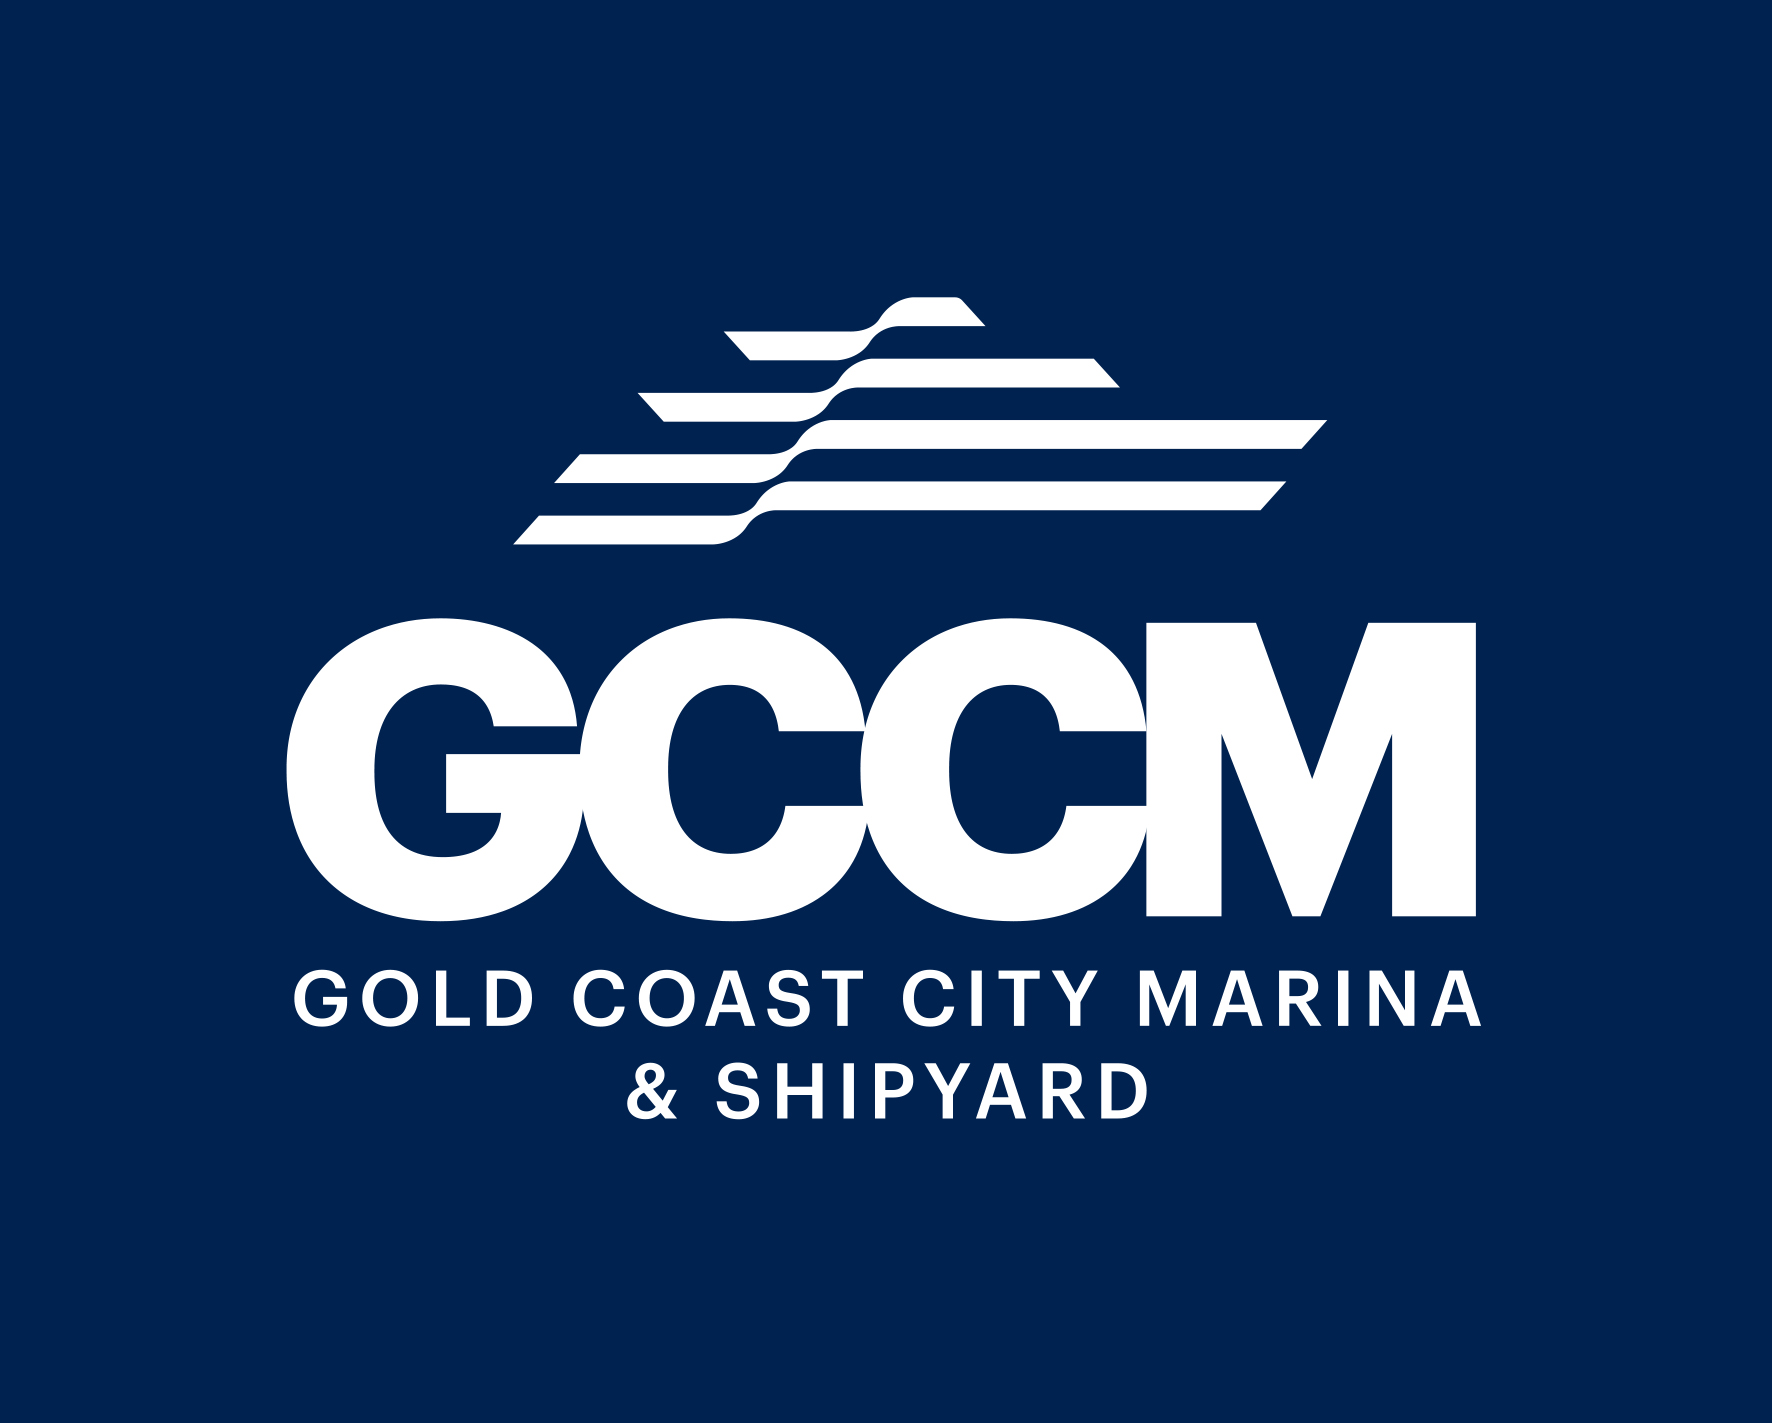 gccm-logo.jpg